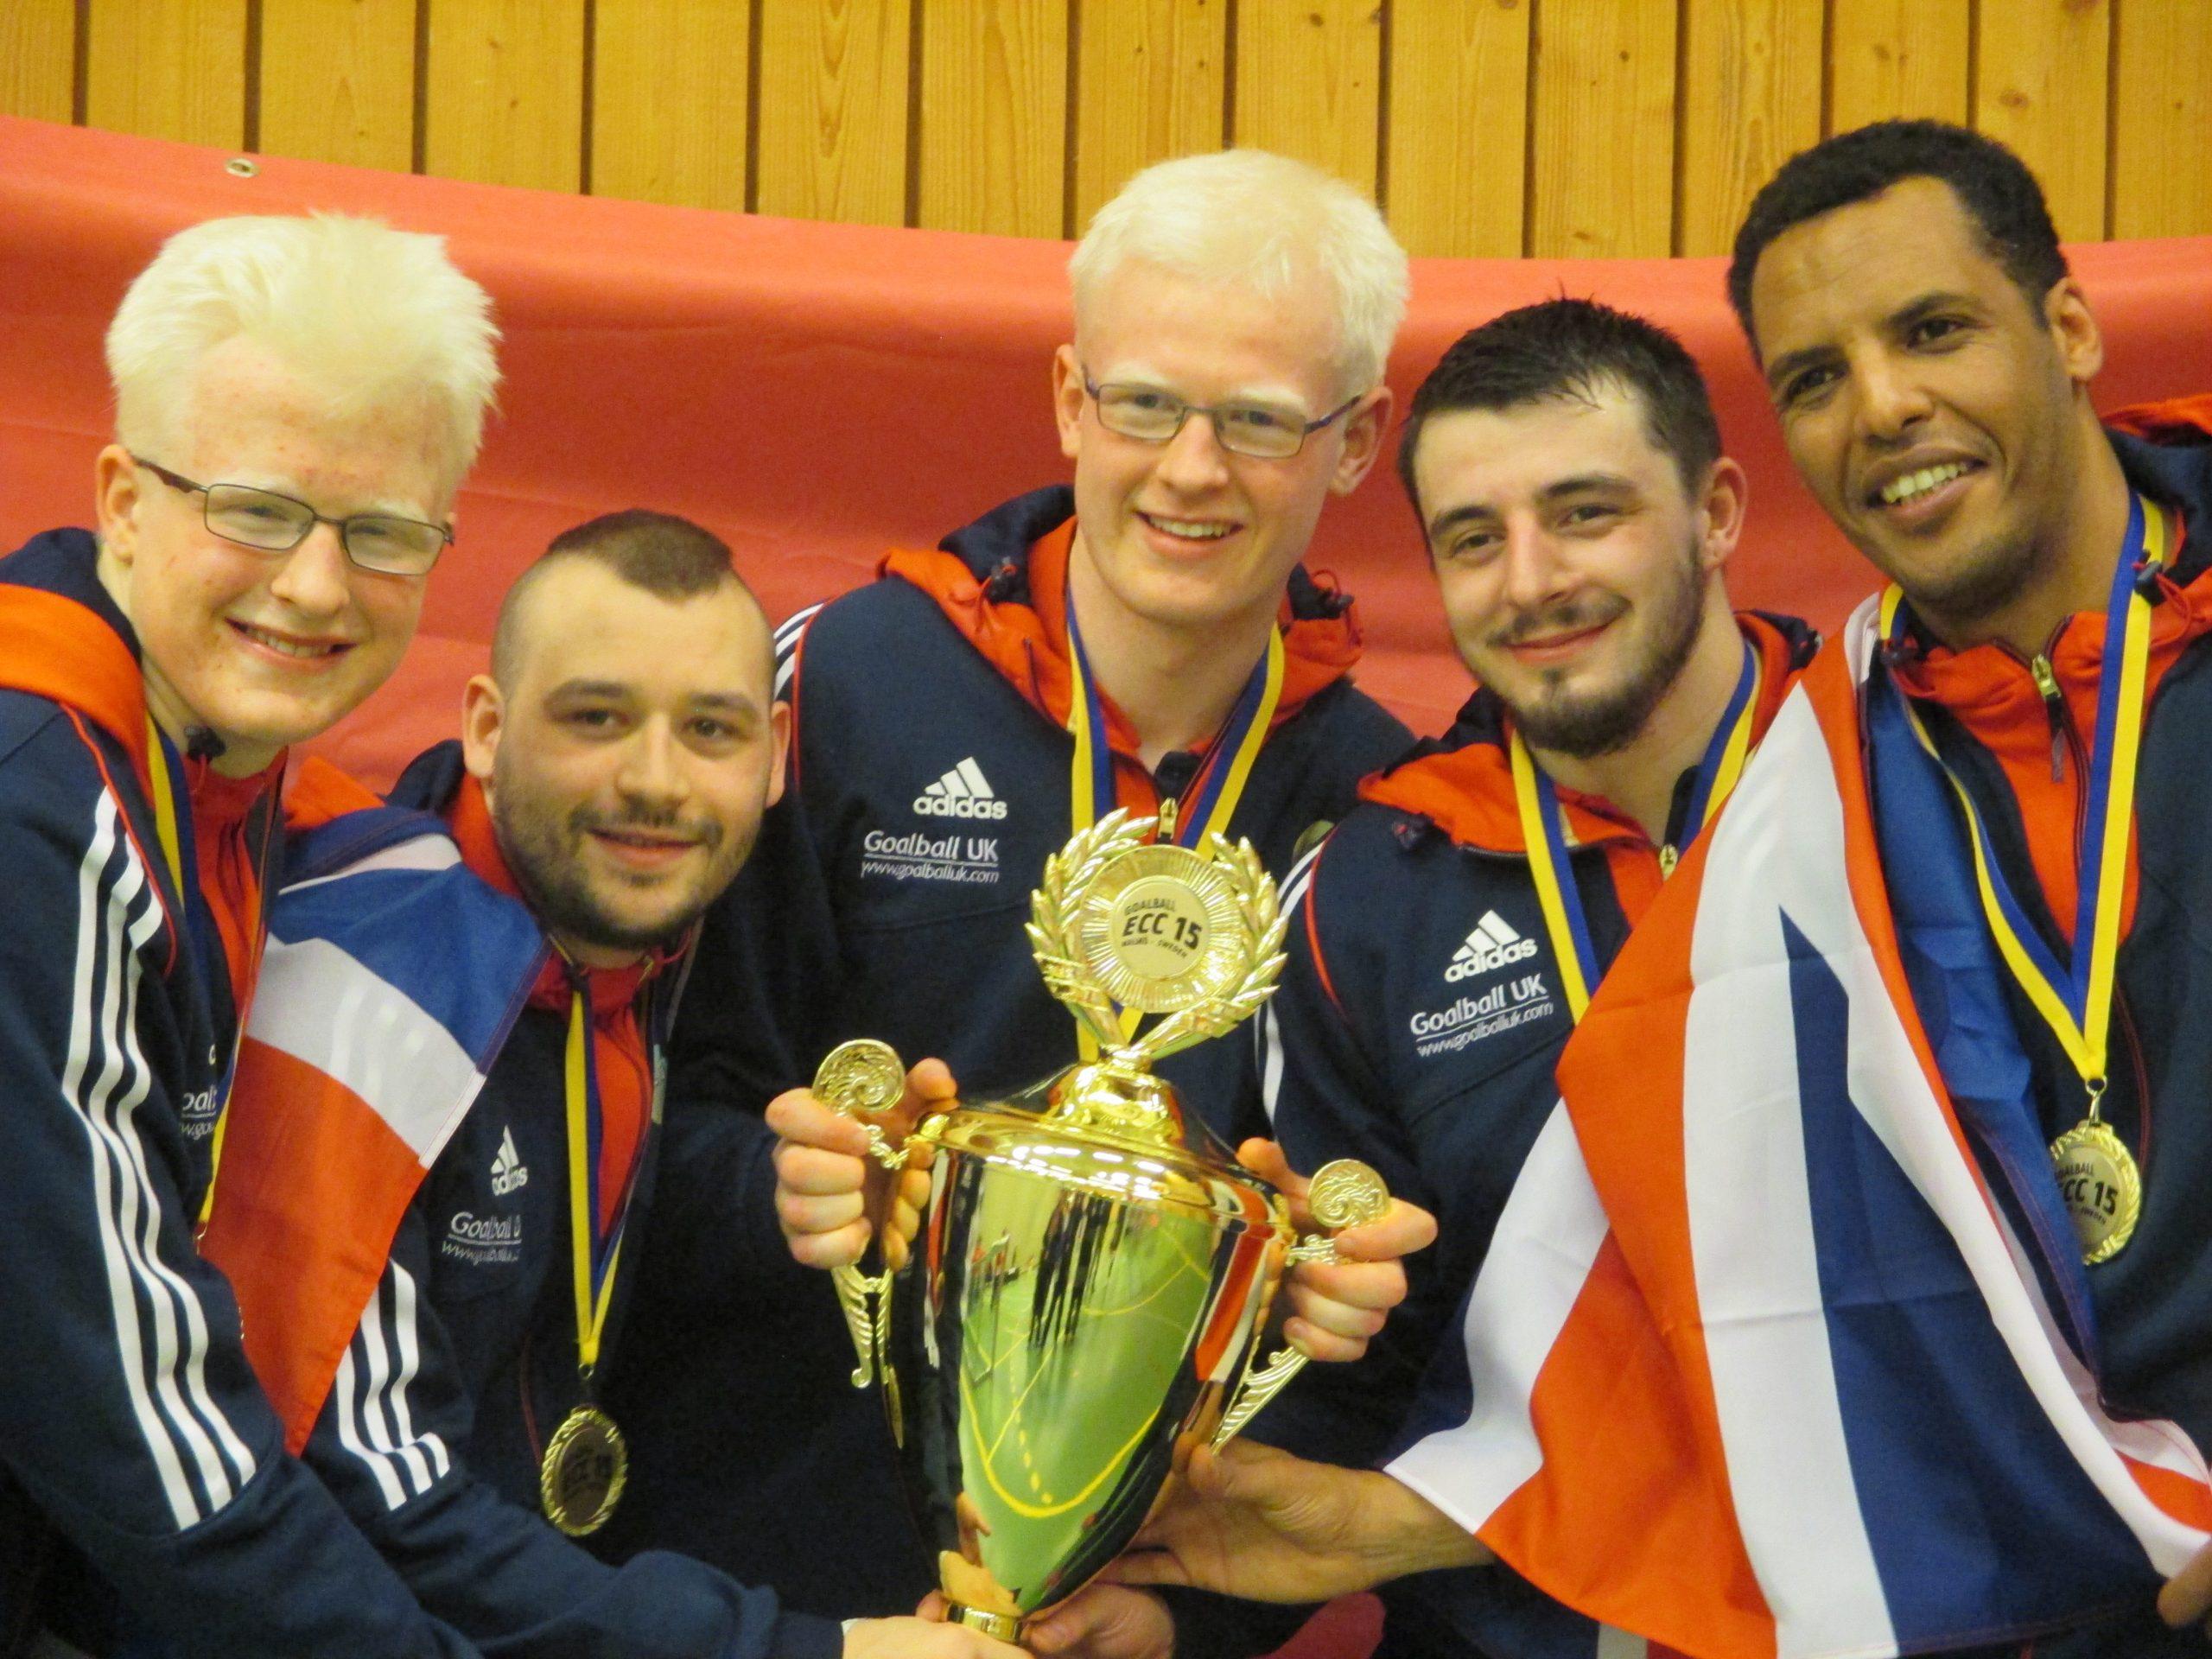 Team GB take Malmo by storm at European Goalball Championship